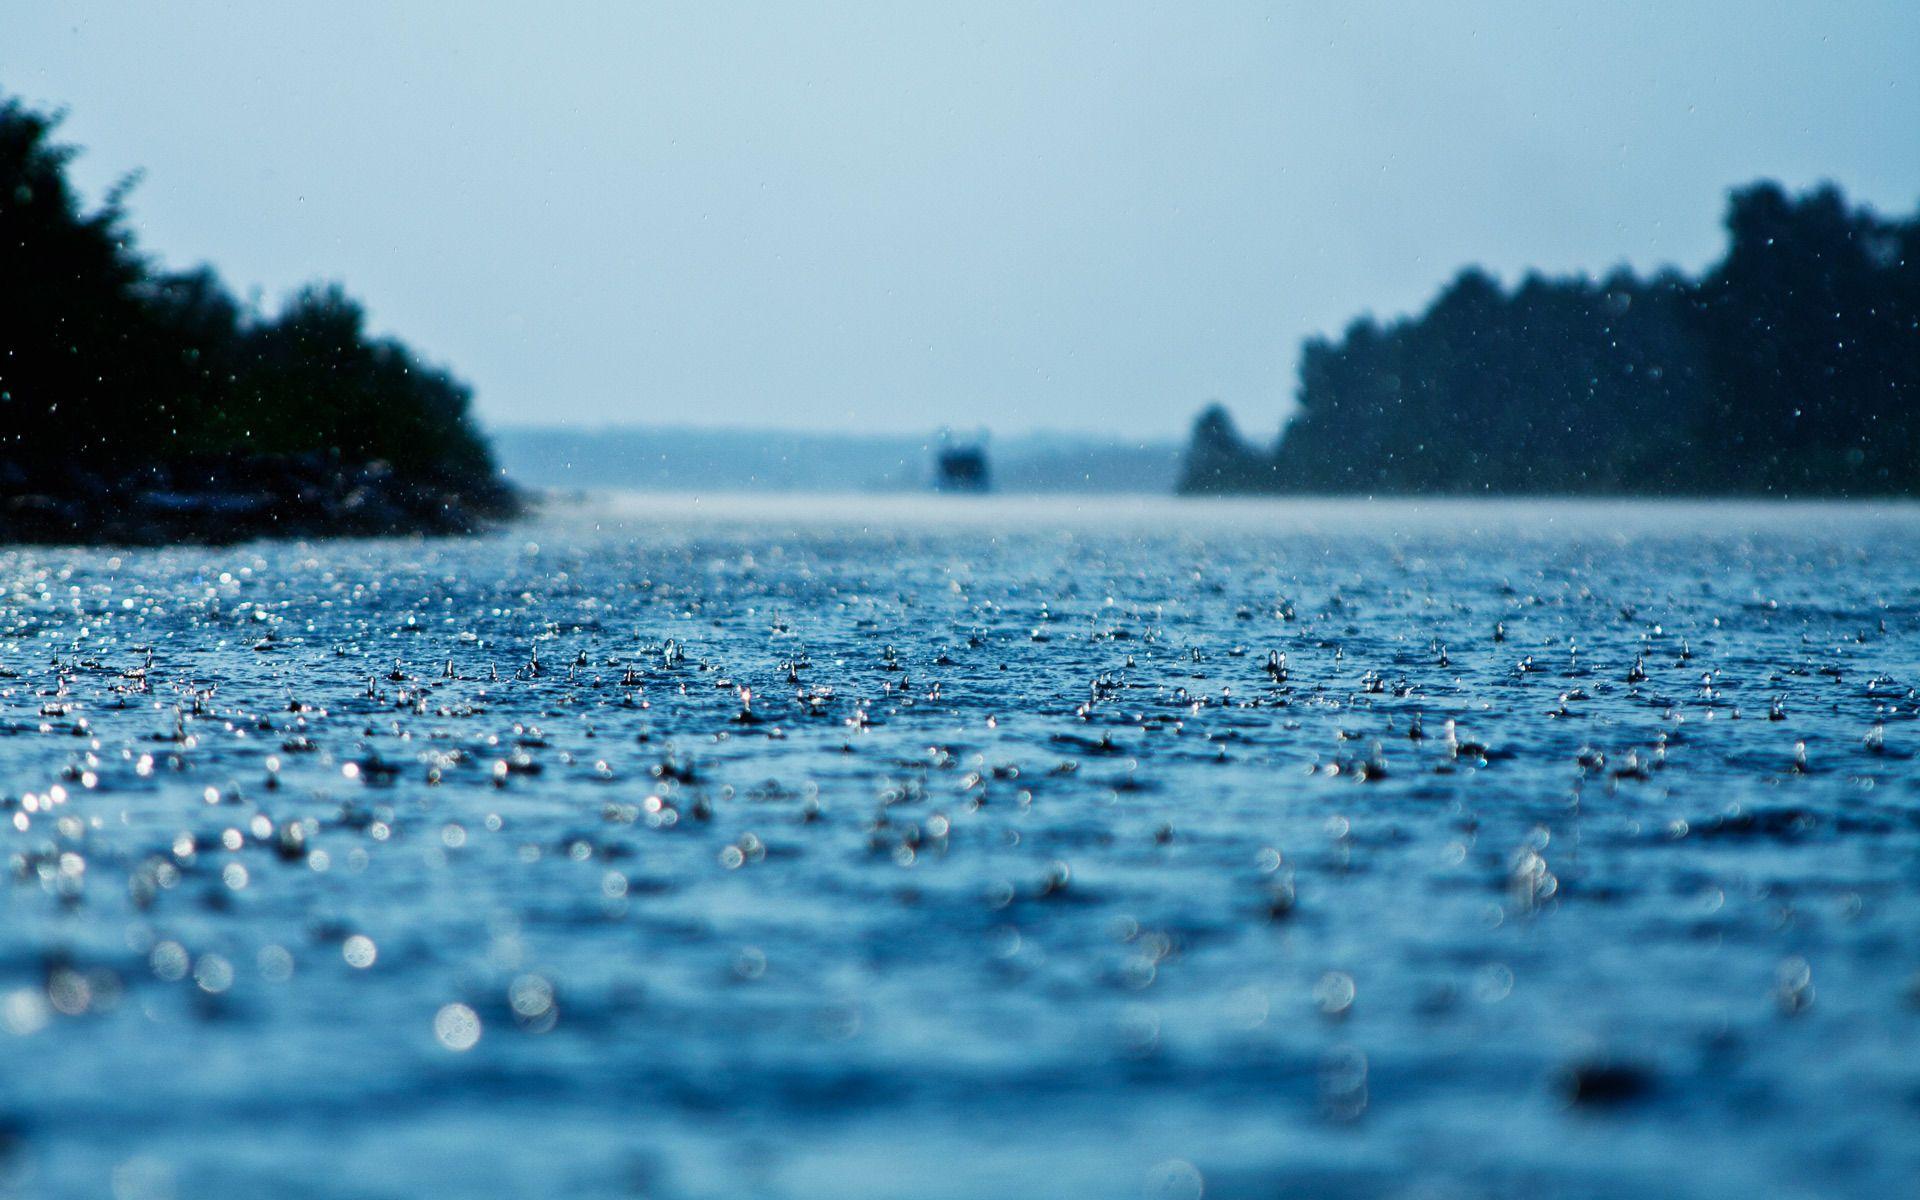 Amazing Rain Water Drops Wallpaper Hd For Desktop